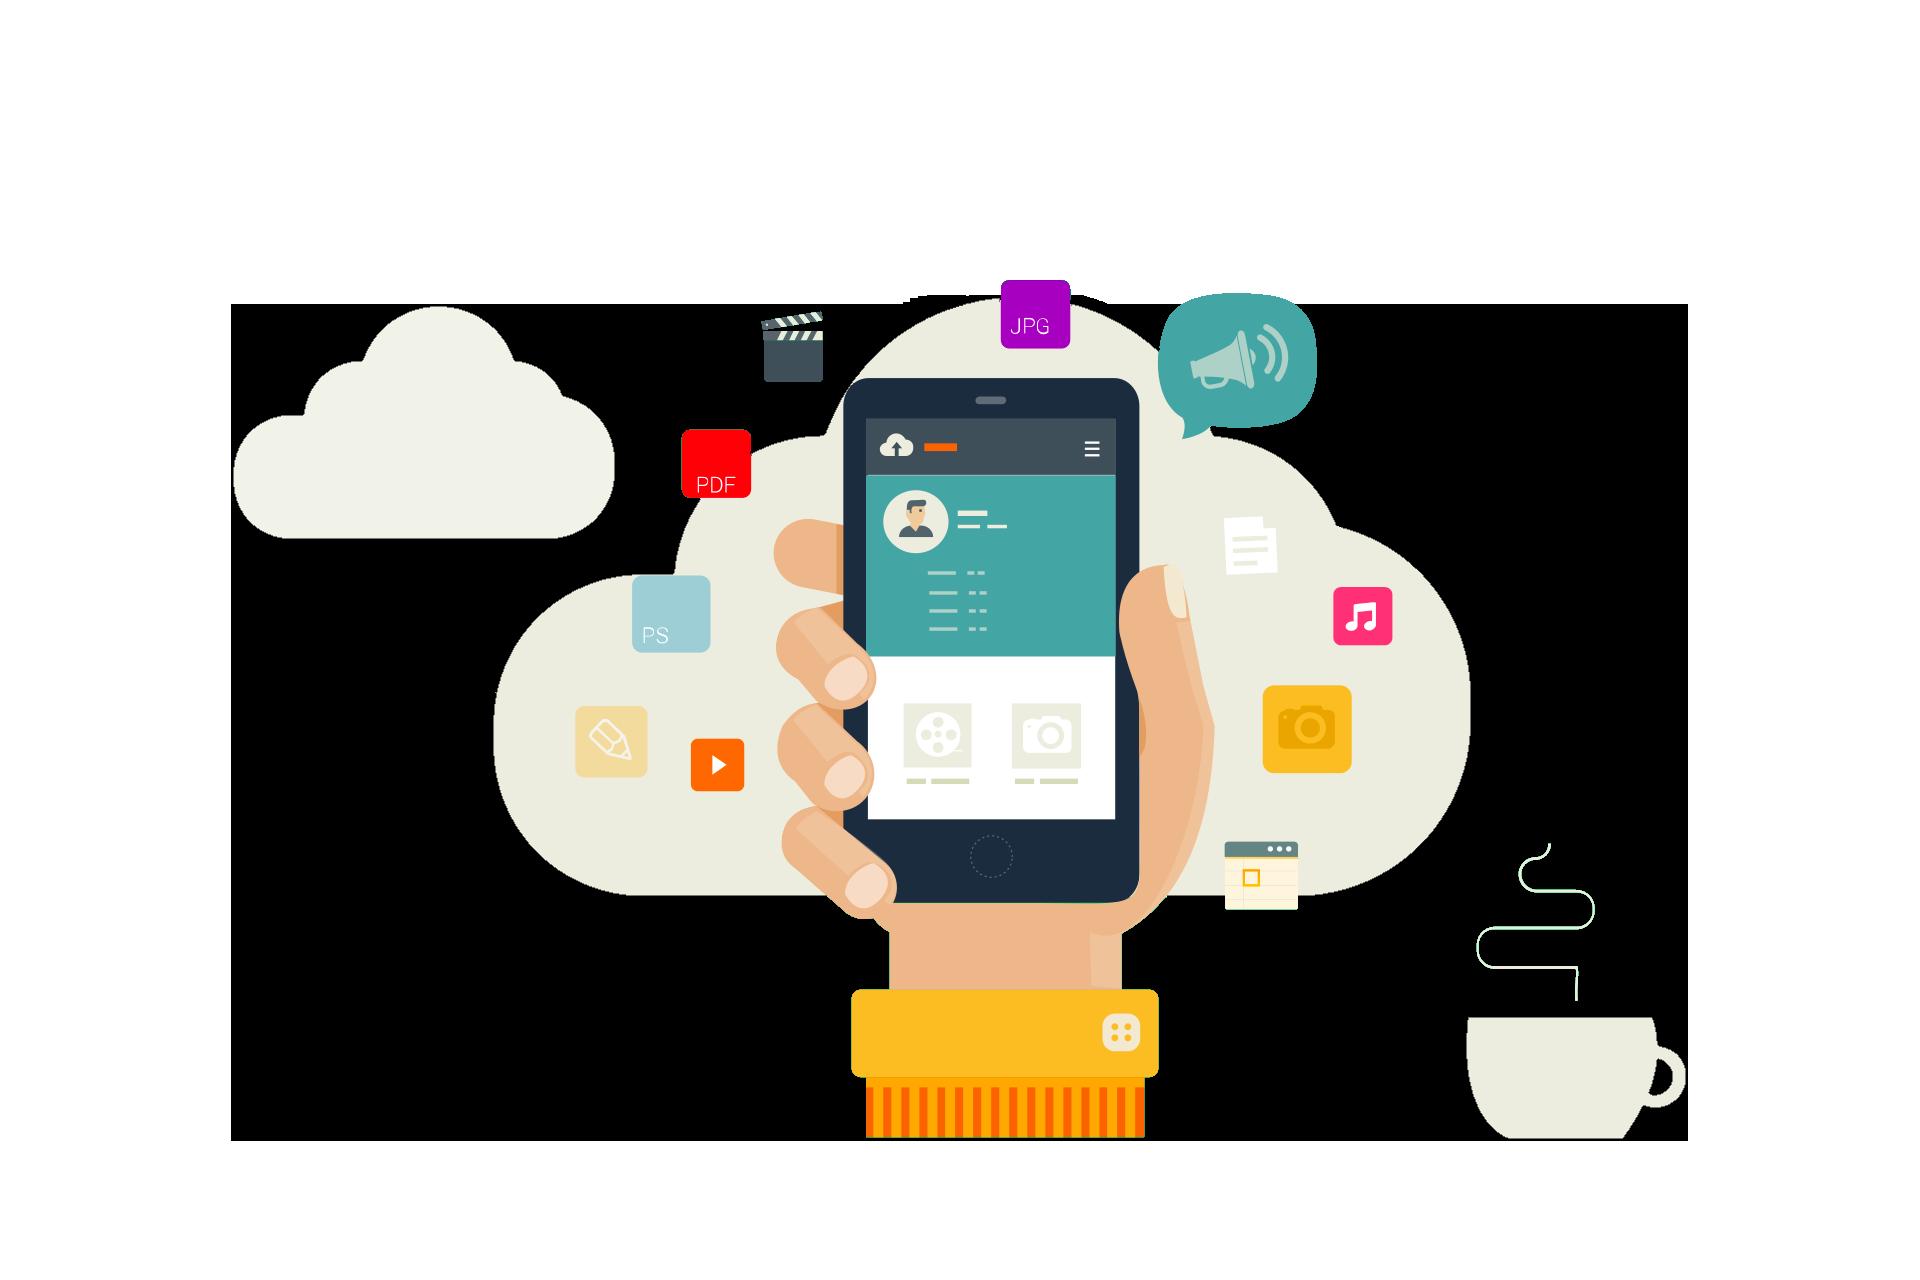 Cloud - SMART WORKING Lombardia